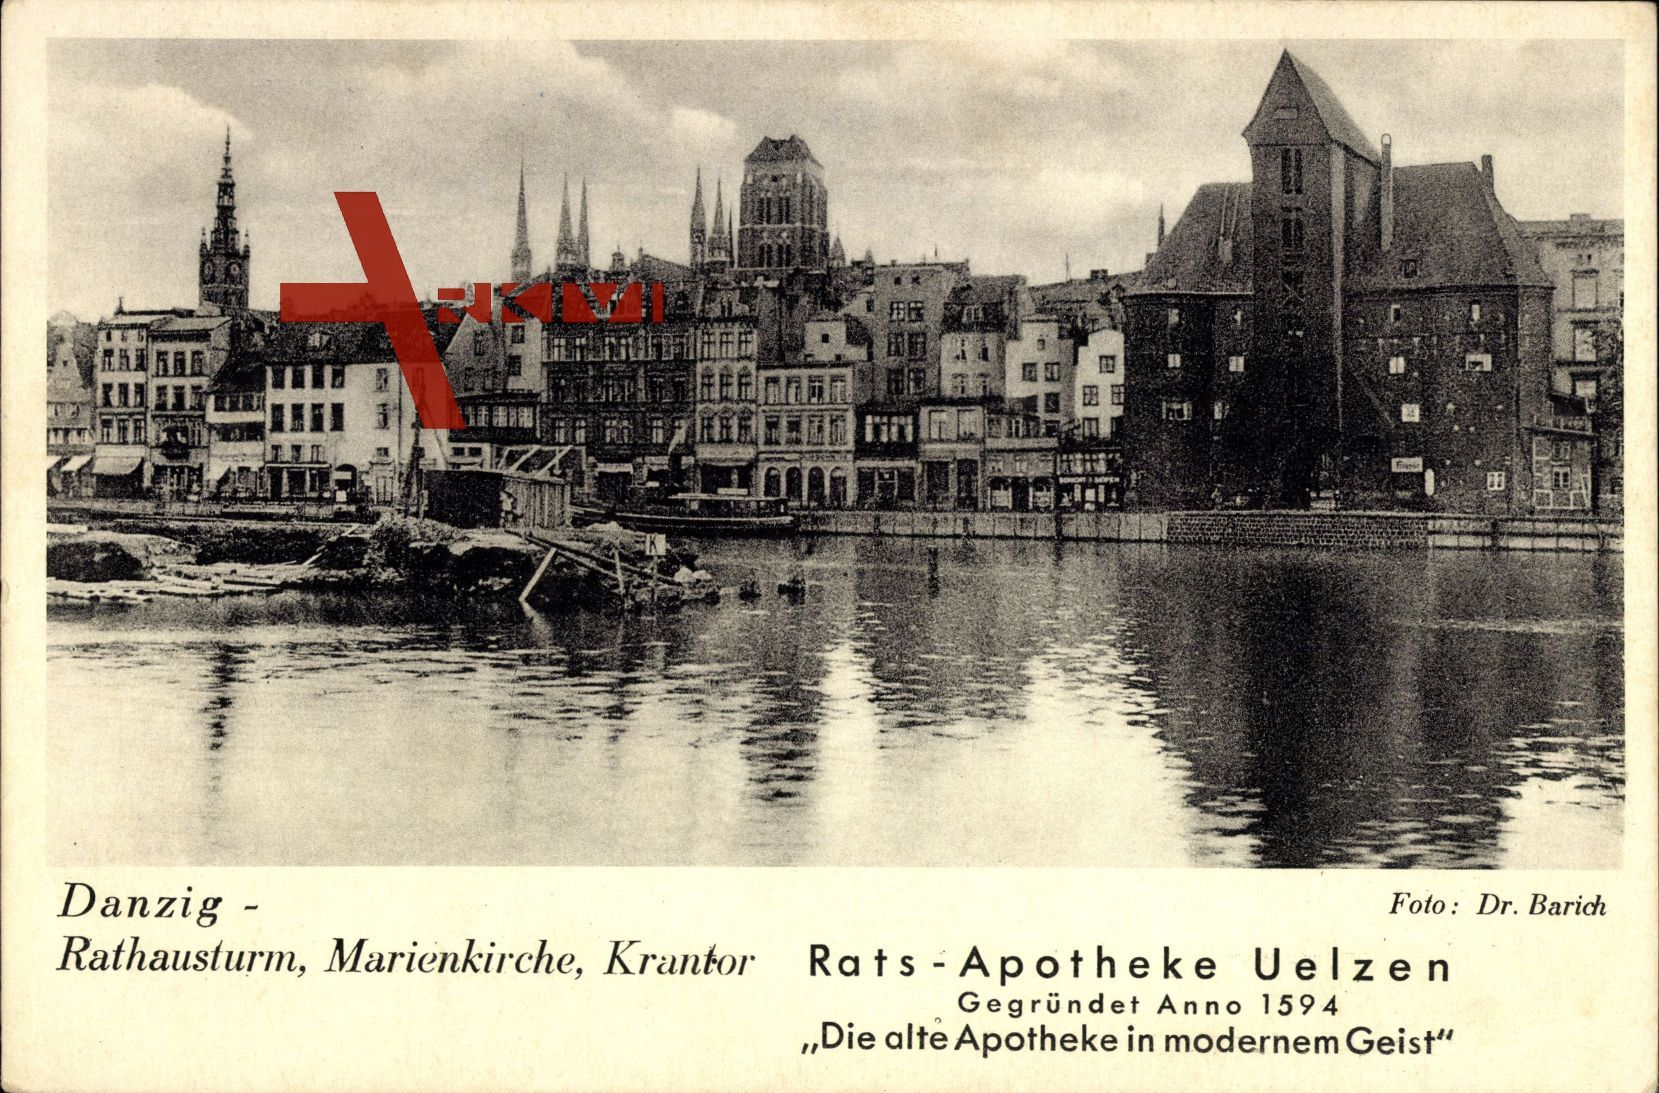 Gdańsk Danzig, Rathausturm, Marienkirche, Krantor, Rats Apotheke Uelzen